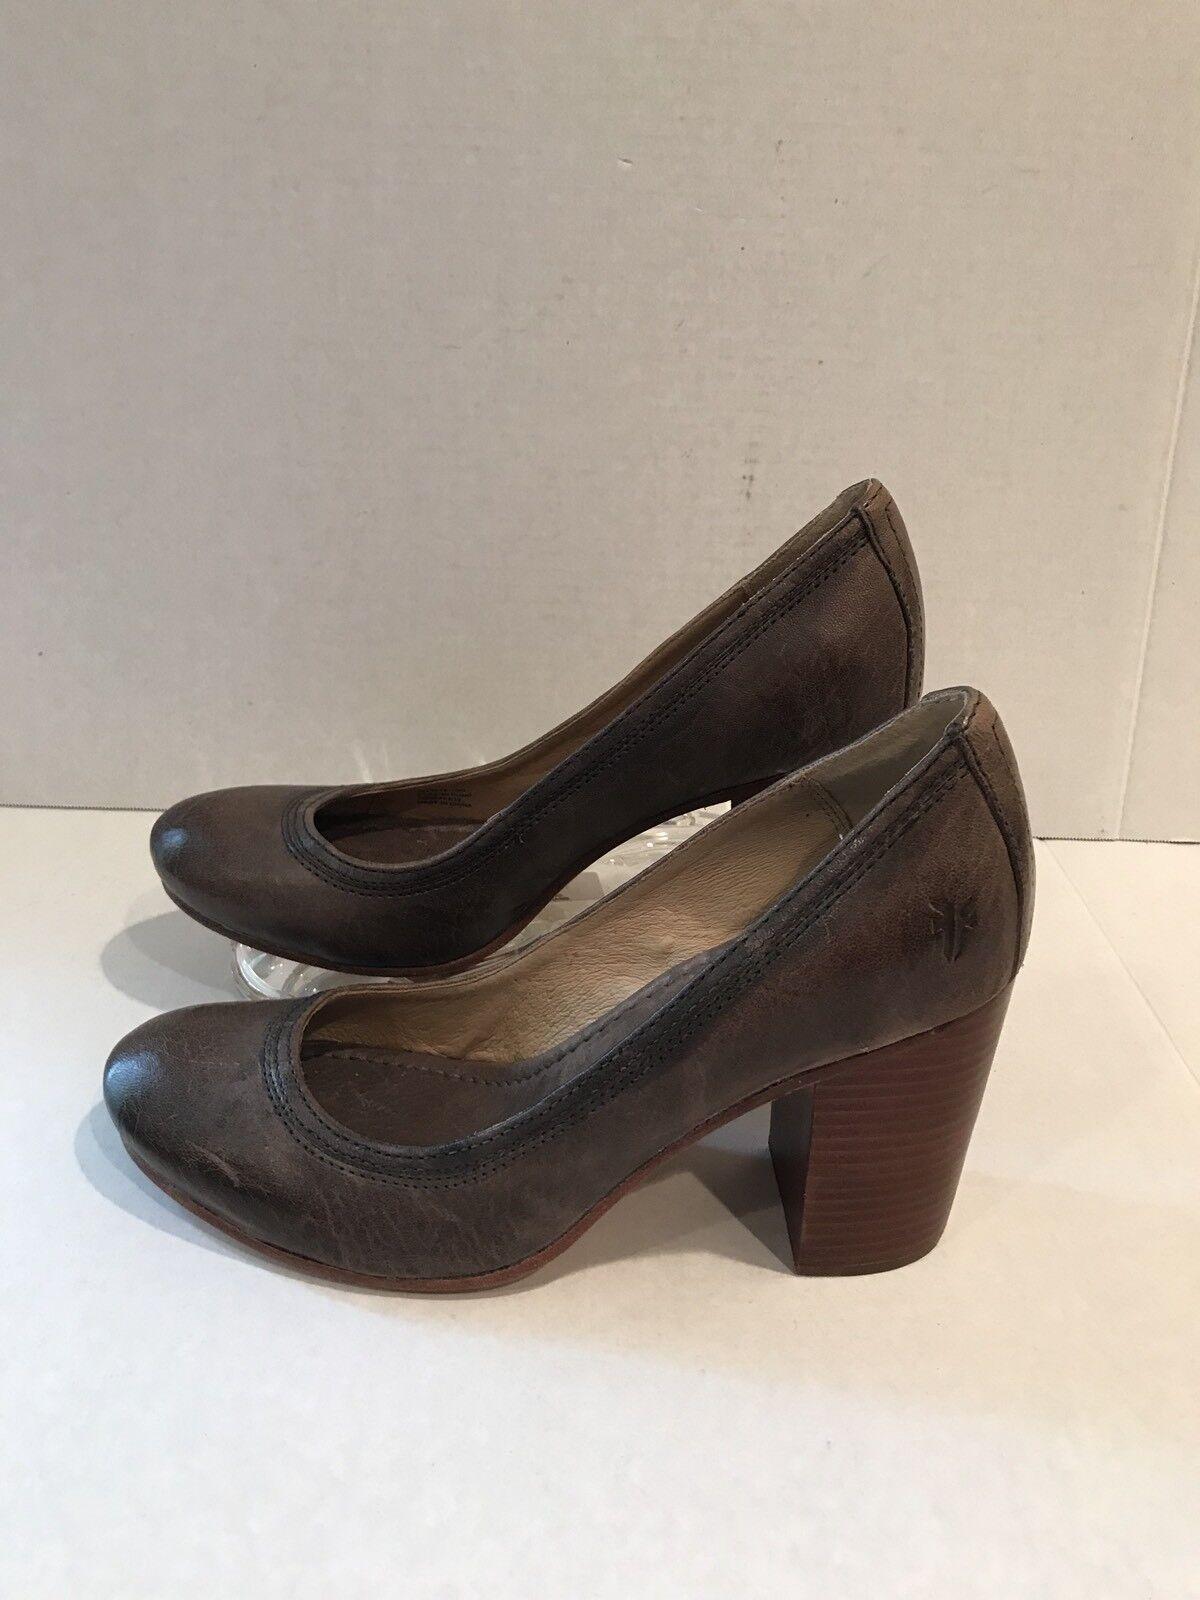 Frye Carson Pumps Gray Rustic Cognac Leder Block Heels Damenschuhe Schuhes Größe 10